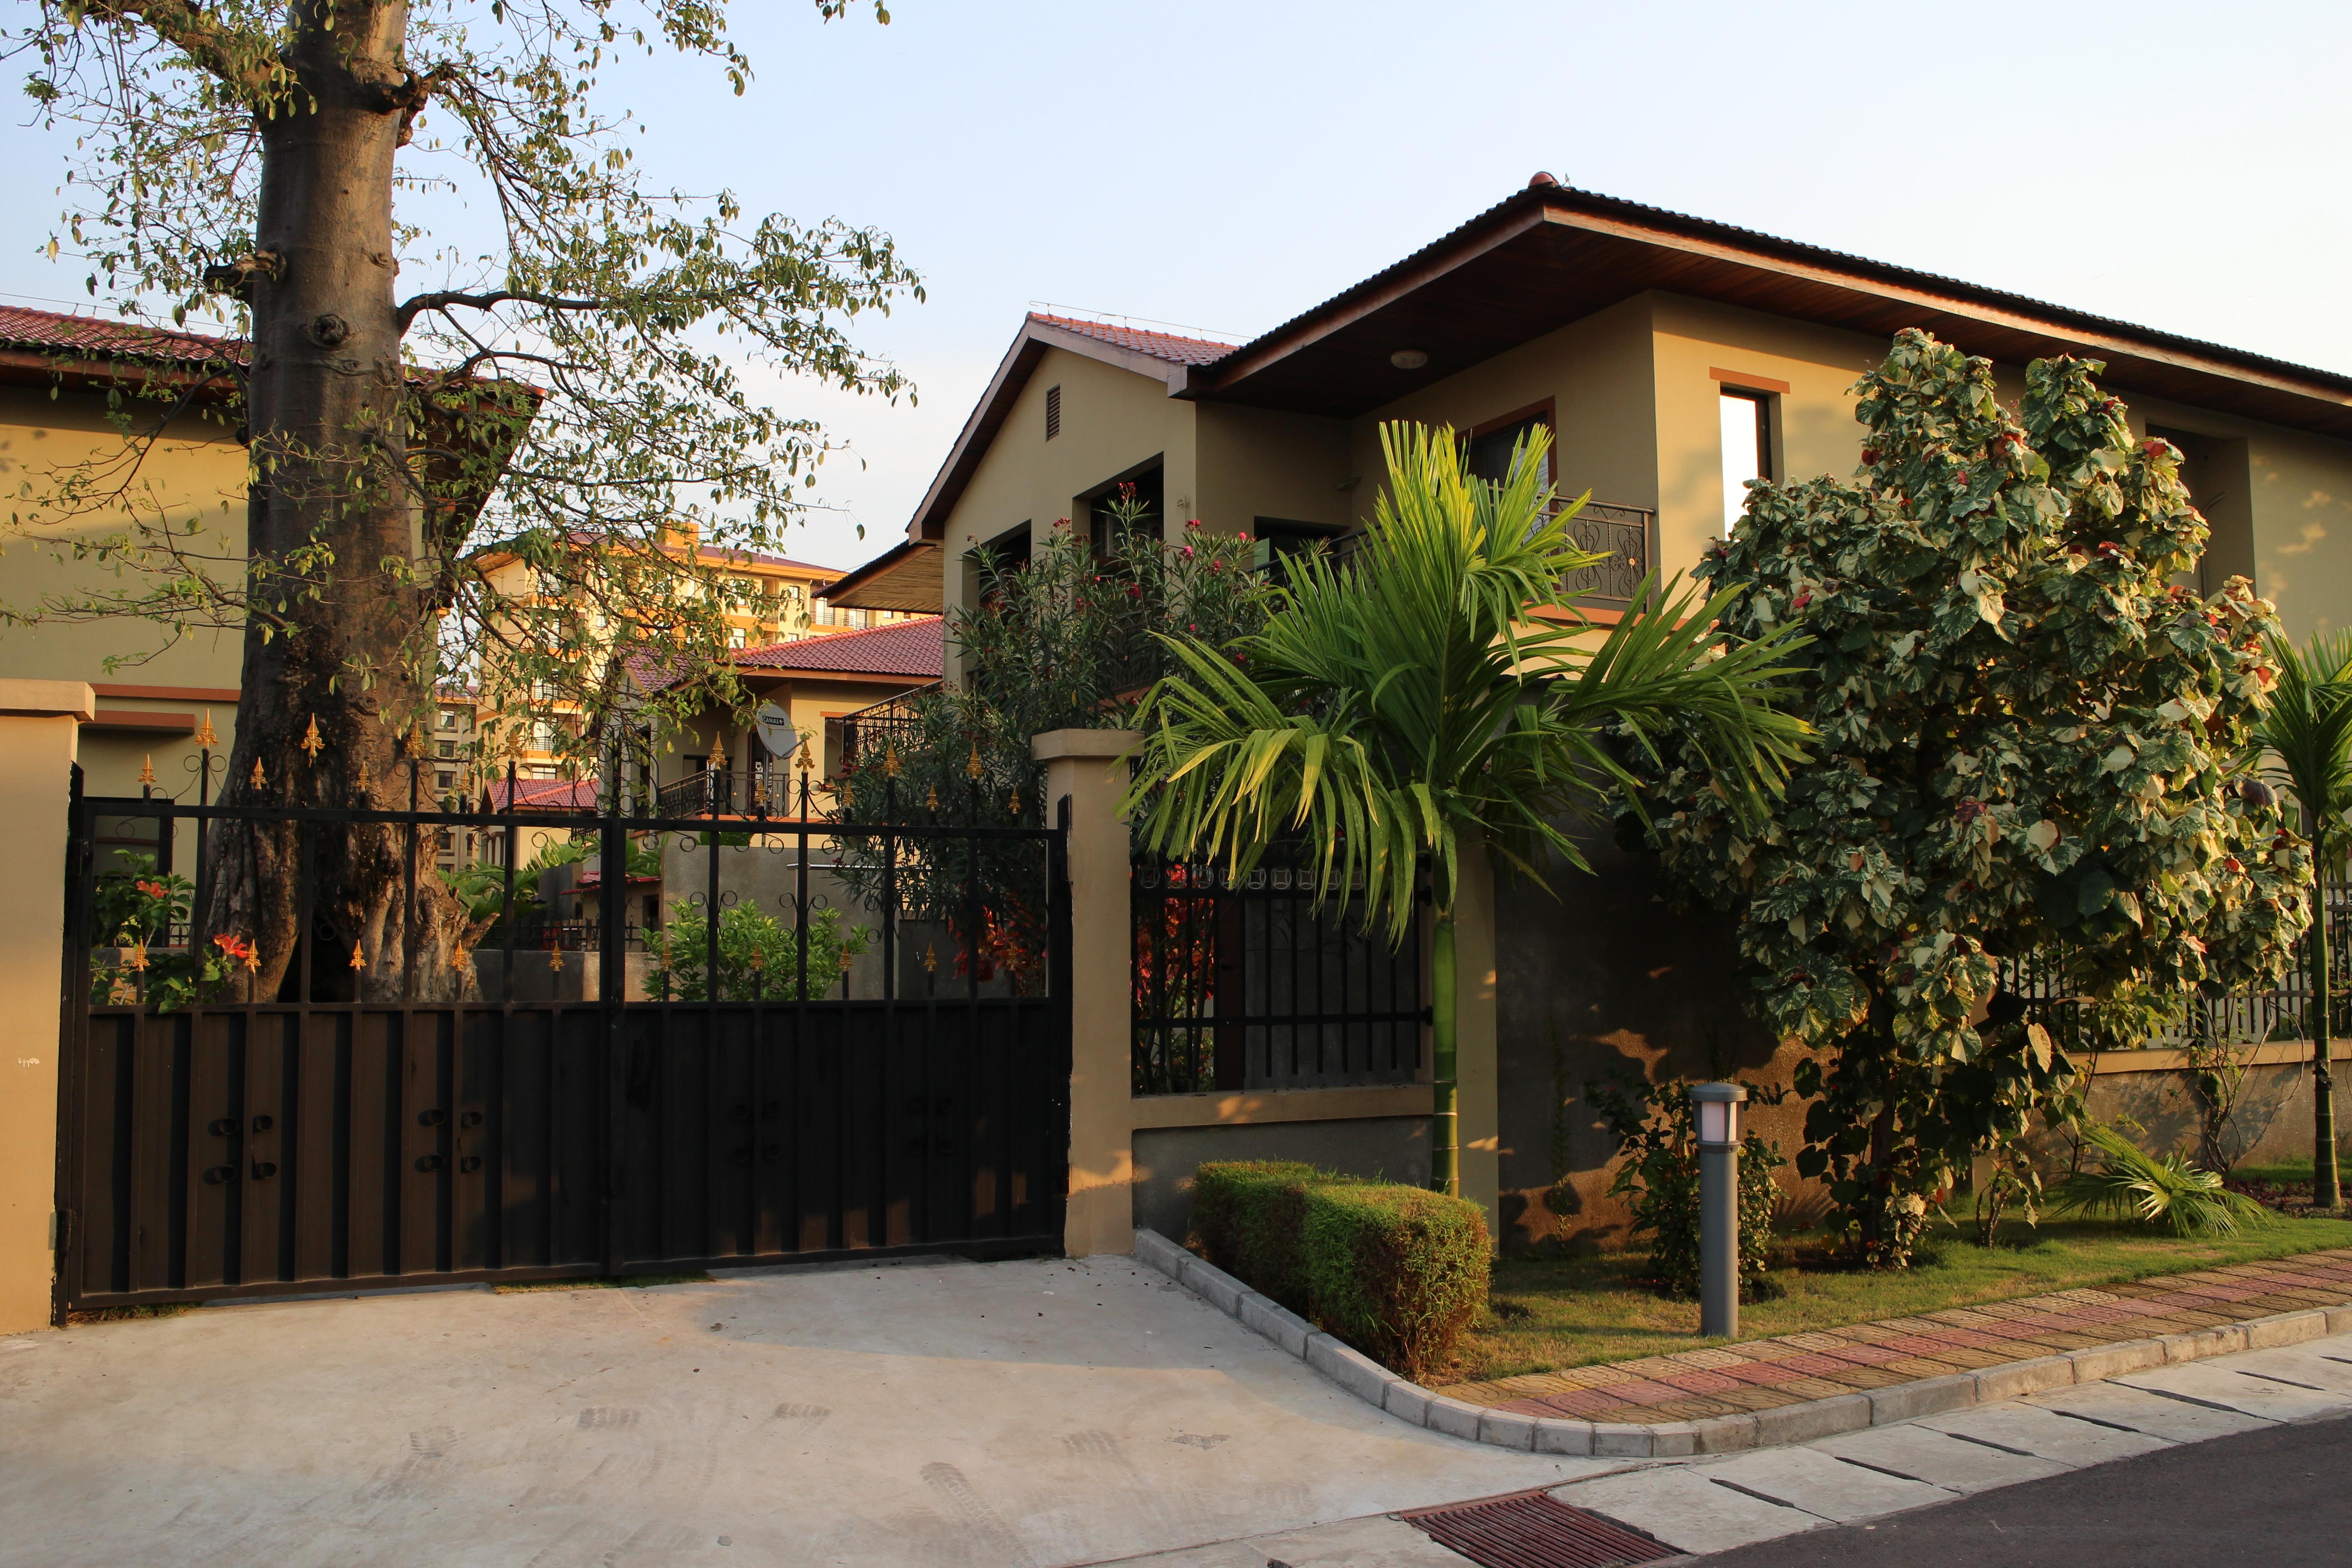 Kin oasis city real estate complex